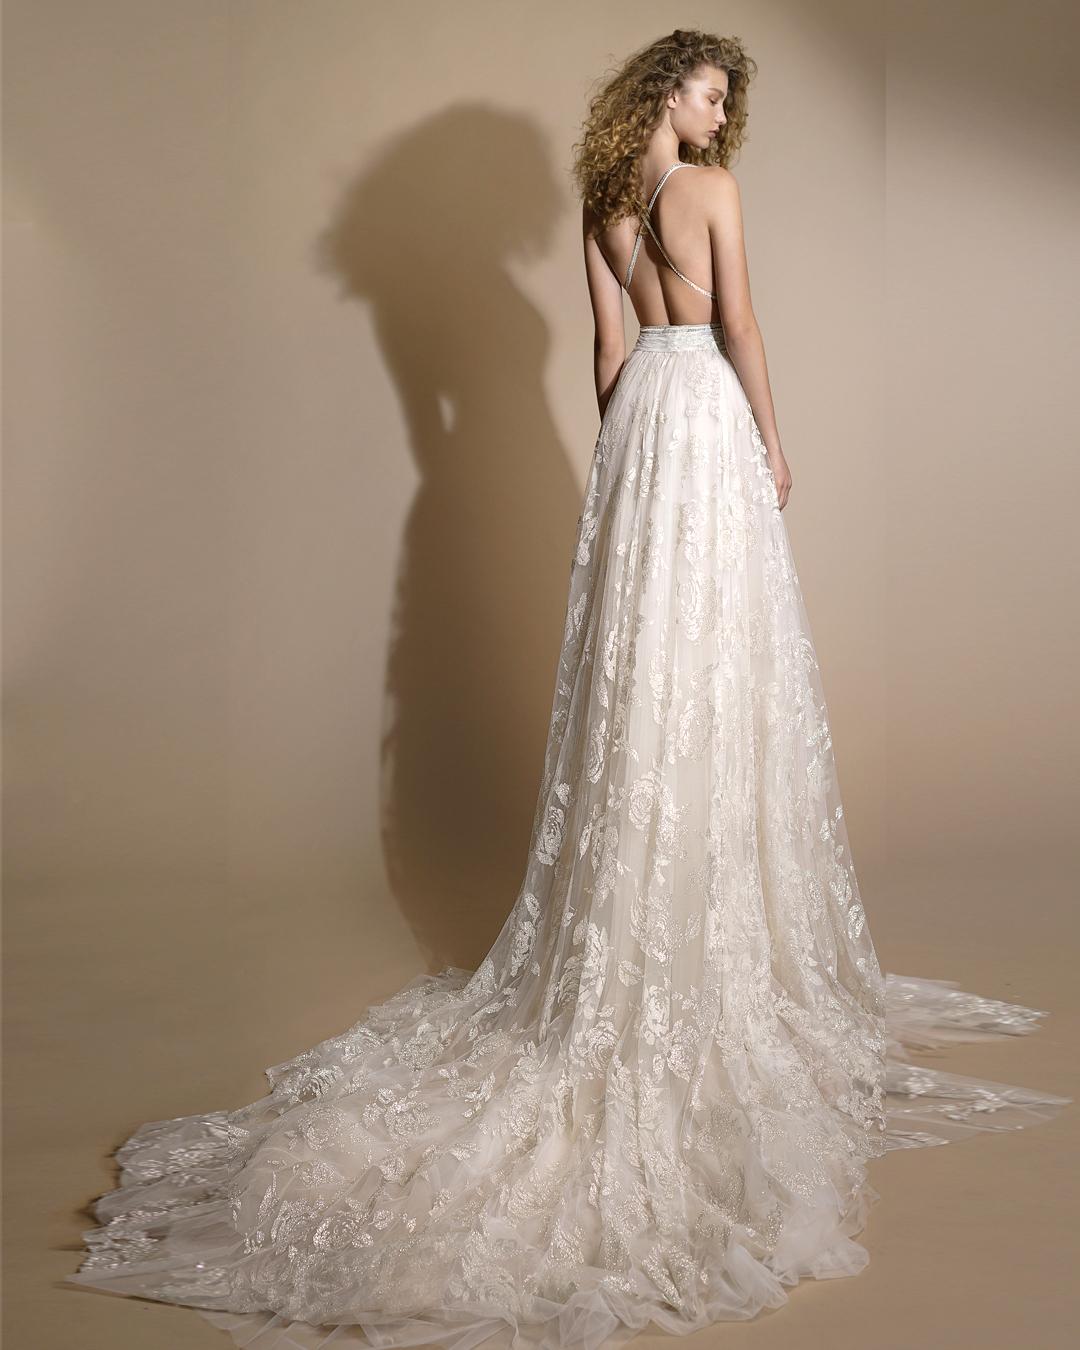 galia lahav gala wedding dress spring 2019 lace spaghetti strap a-line